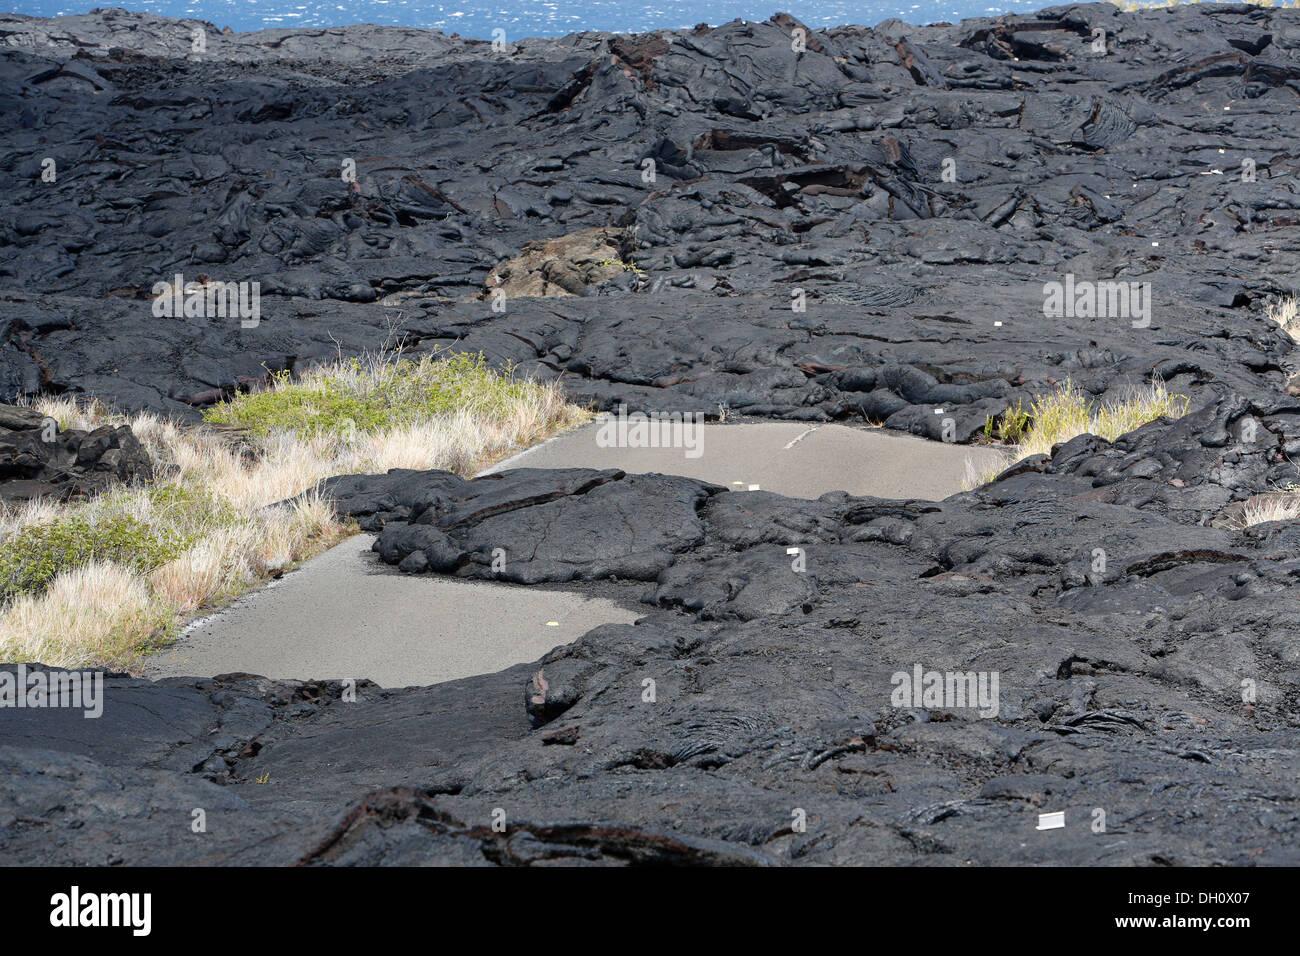 Lava-covered road, East Rift Zone, Kilauea volcano, Hawaii Volcanoes National Park, Big Island, USA - Stock Image